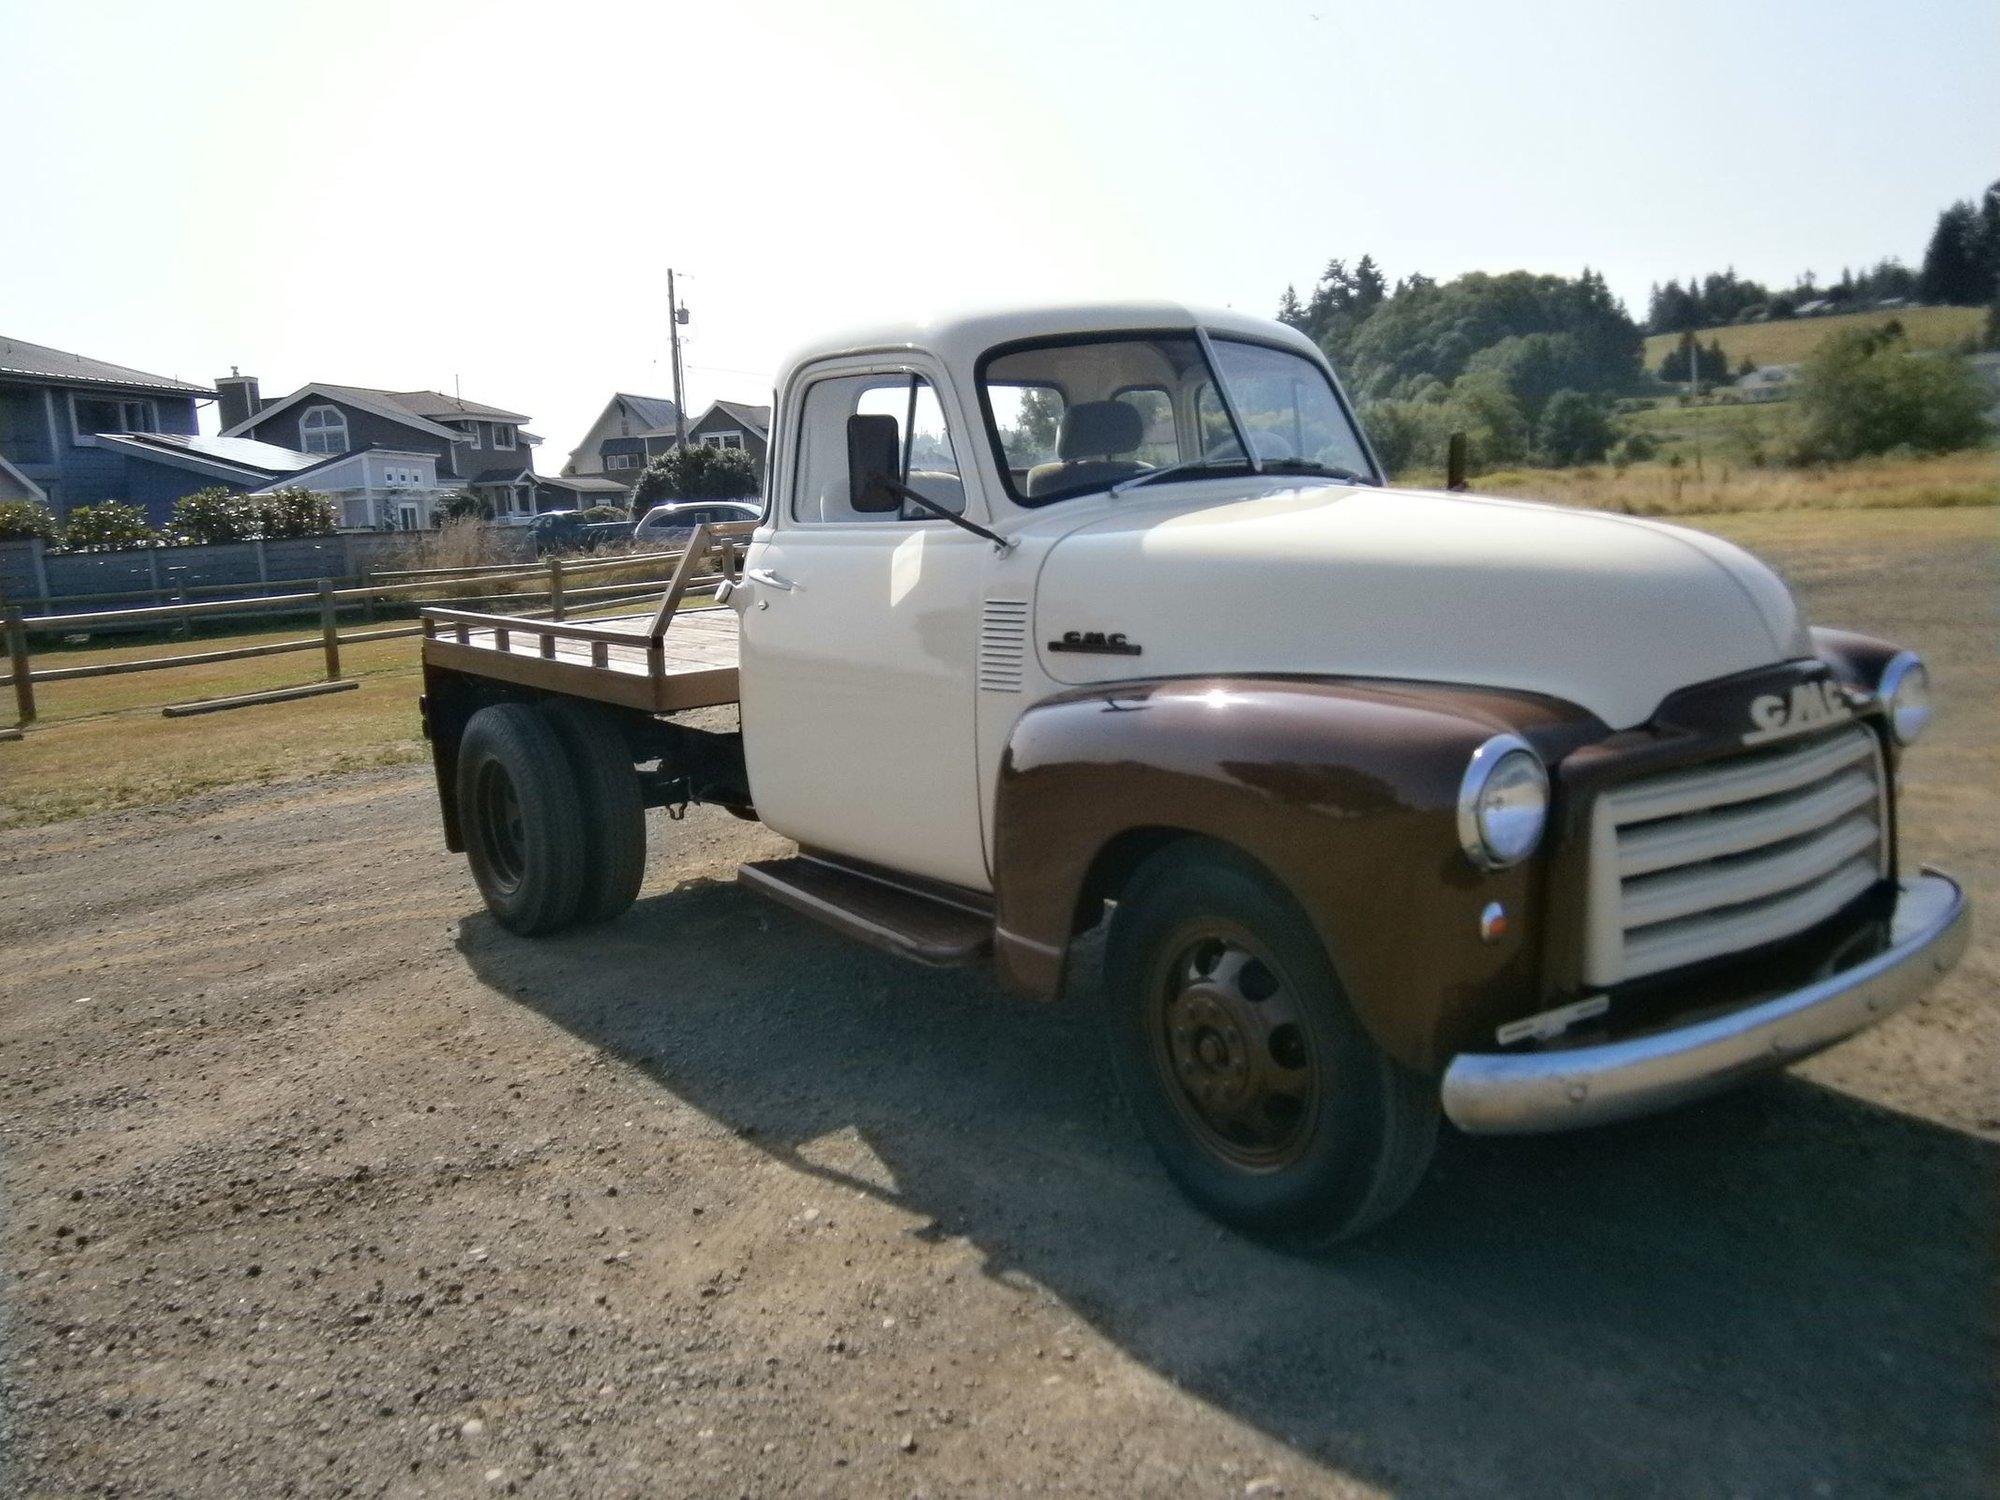 1951 Gmc Truck In Tacoma Wa United States For Sale 10591408